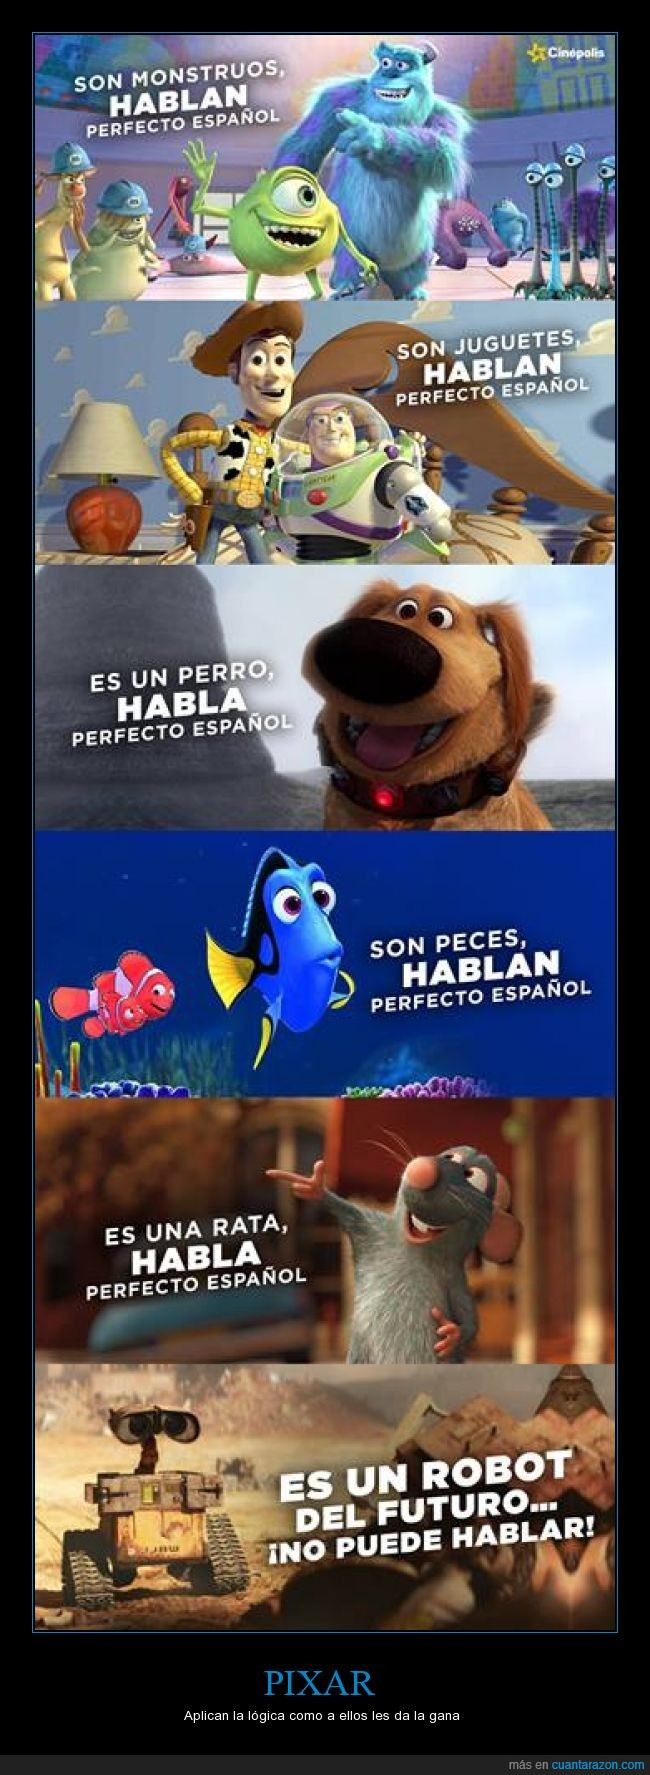 batman,cartel,finding nemo,futuro,hablar,nemo,pixar,ratatouille,robot,toy story,wall-e,woody,ya se que hablan inglés